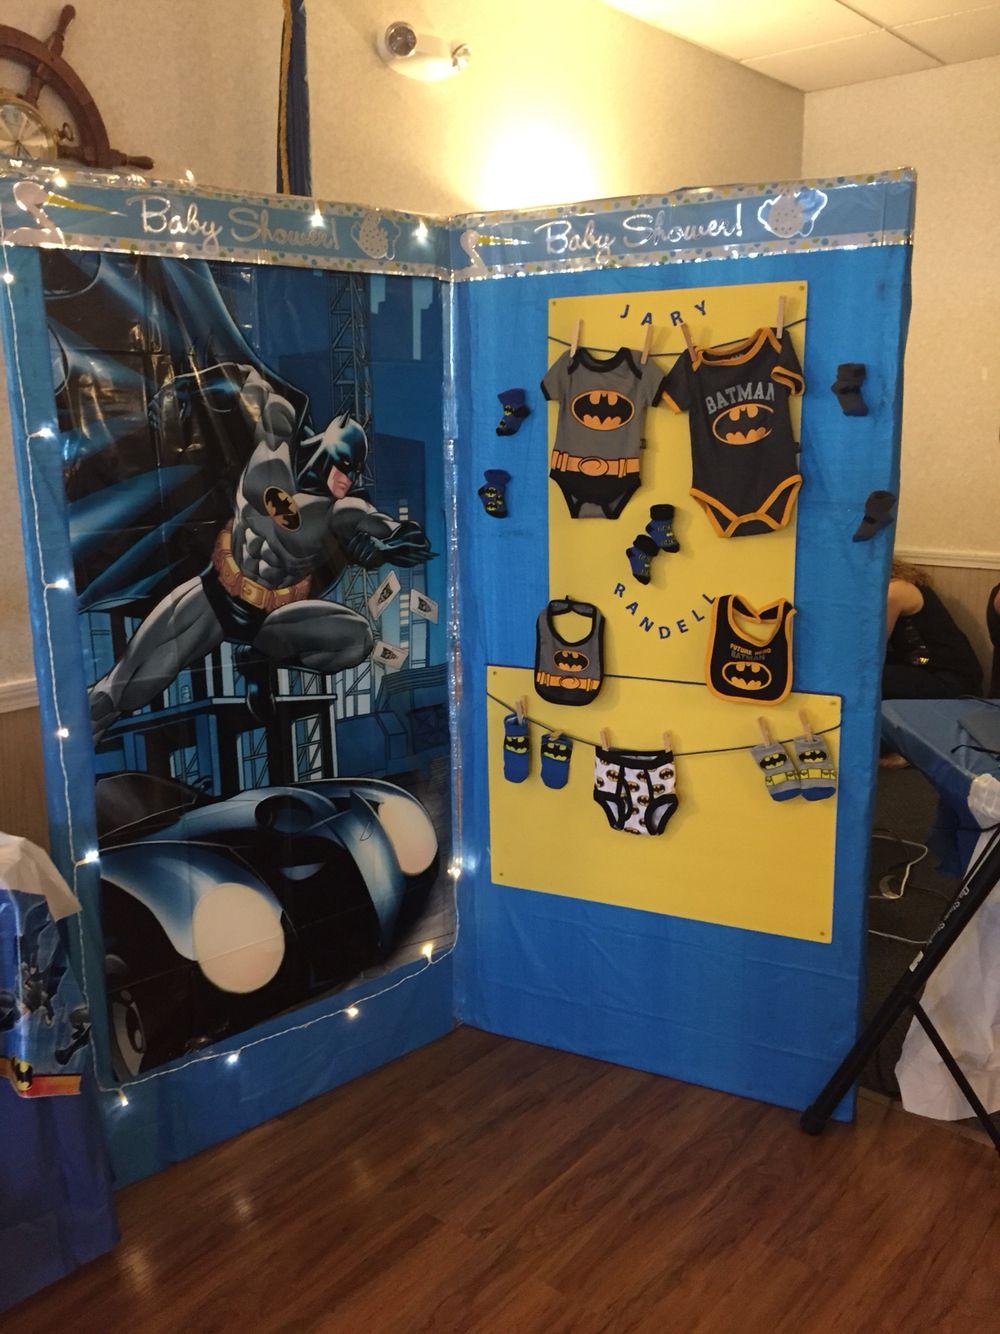 Gmail batman theme - Batman Wall Made By My Mother For My Batman Theme Baby Shower